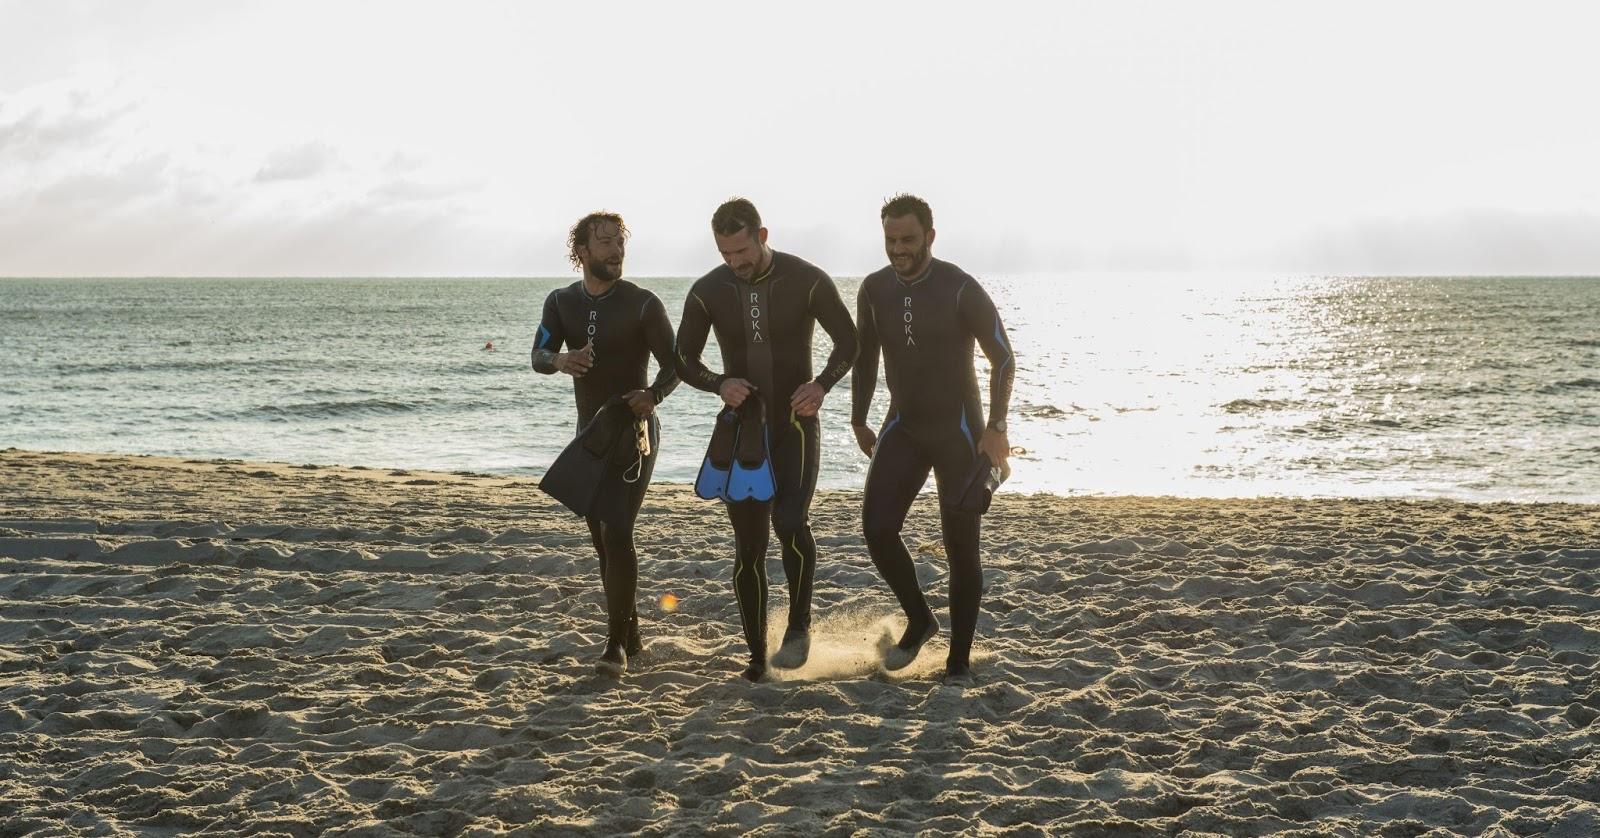 Bear, Caulder y Buddah en una escena en la playa del piloto de Six